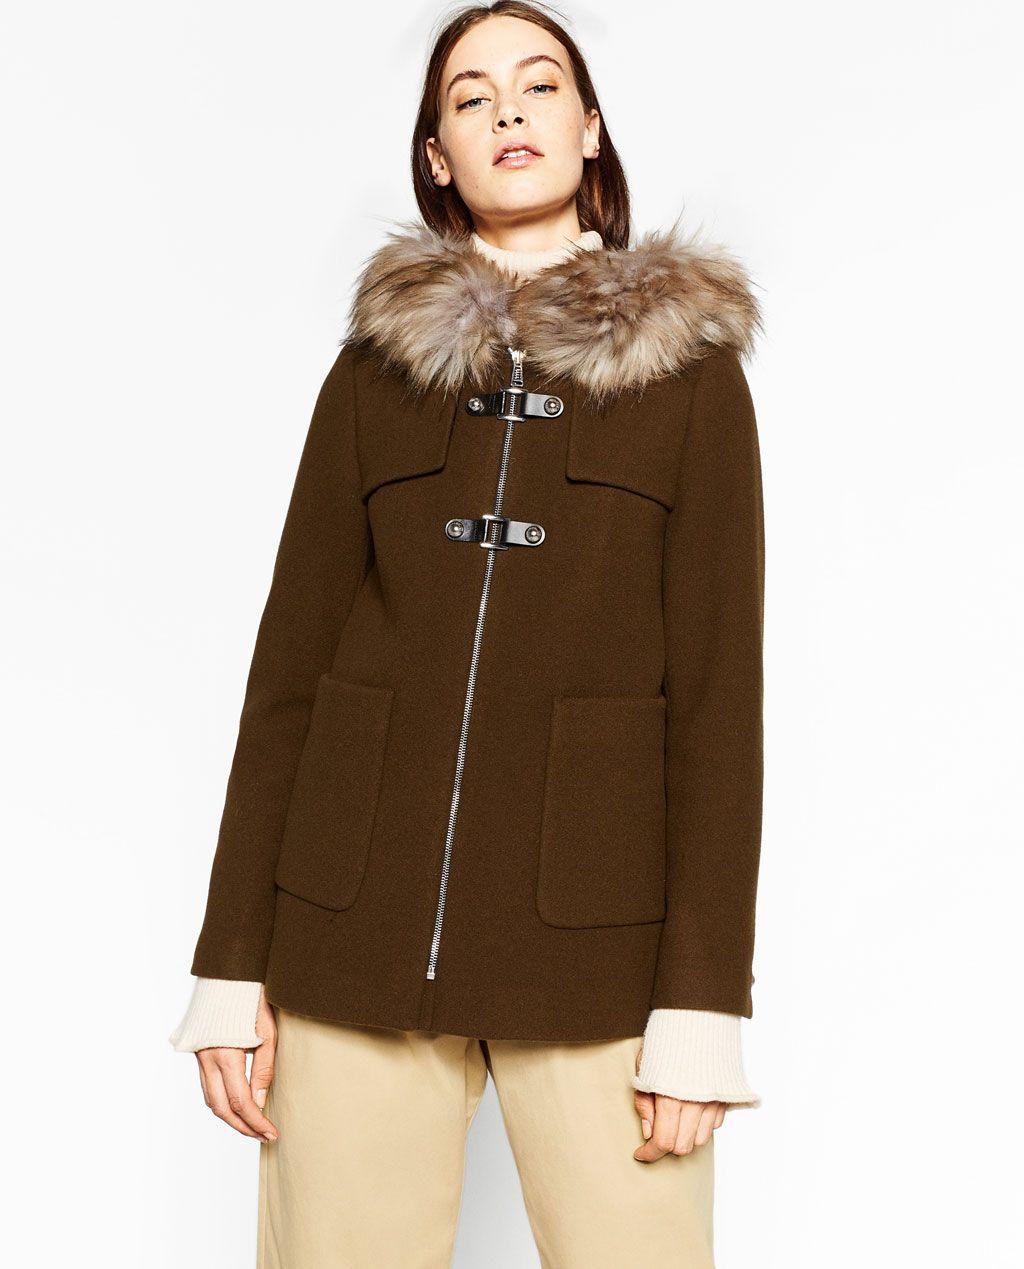 ZARA - WOMAN - A-LINE DUFFLE COAT | My Style | Pinterest | Coats